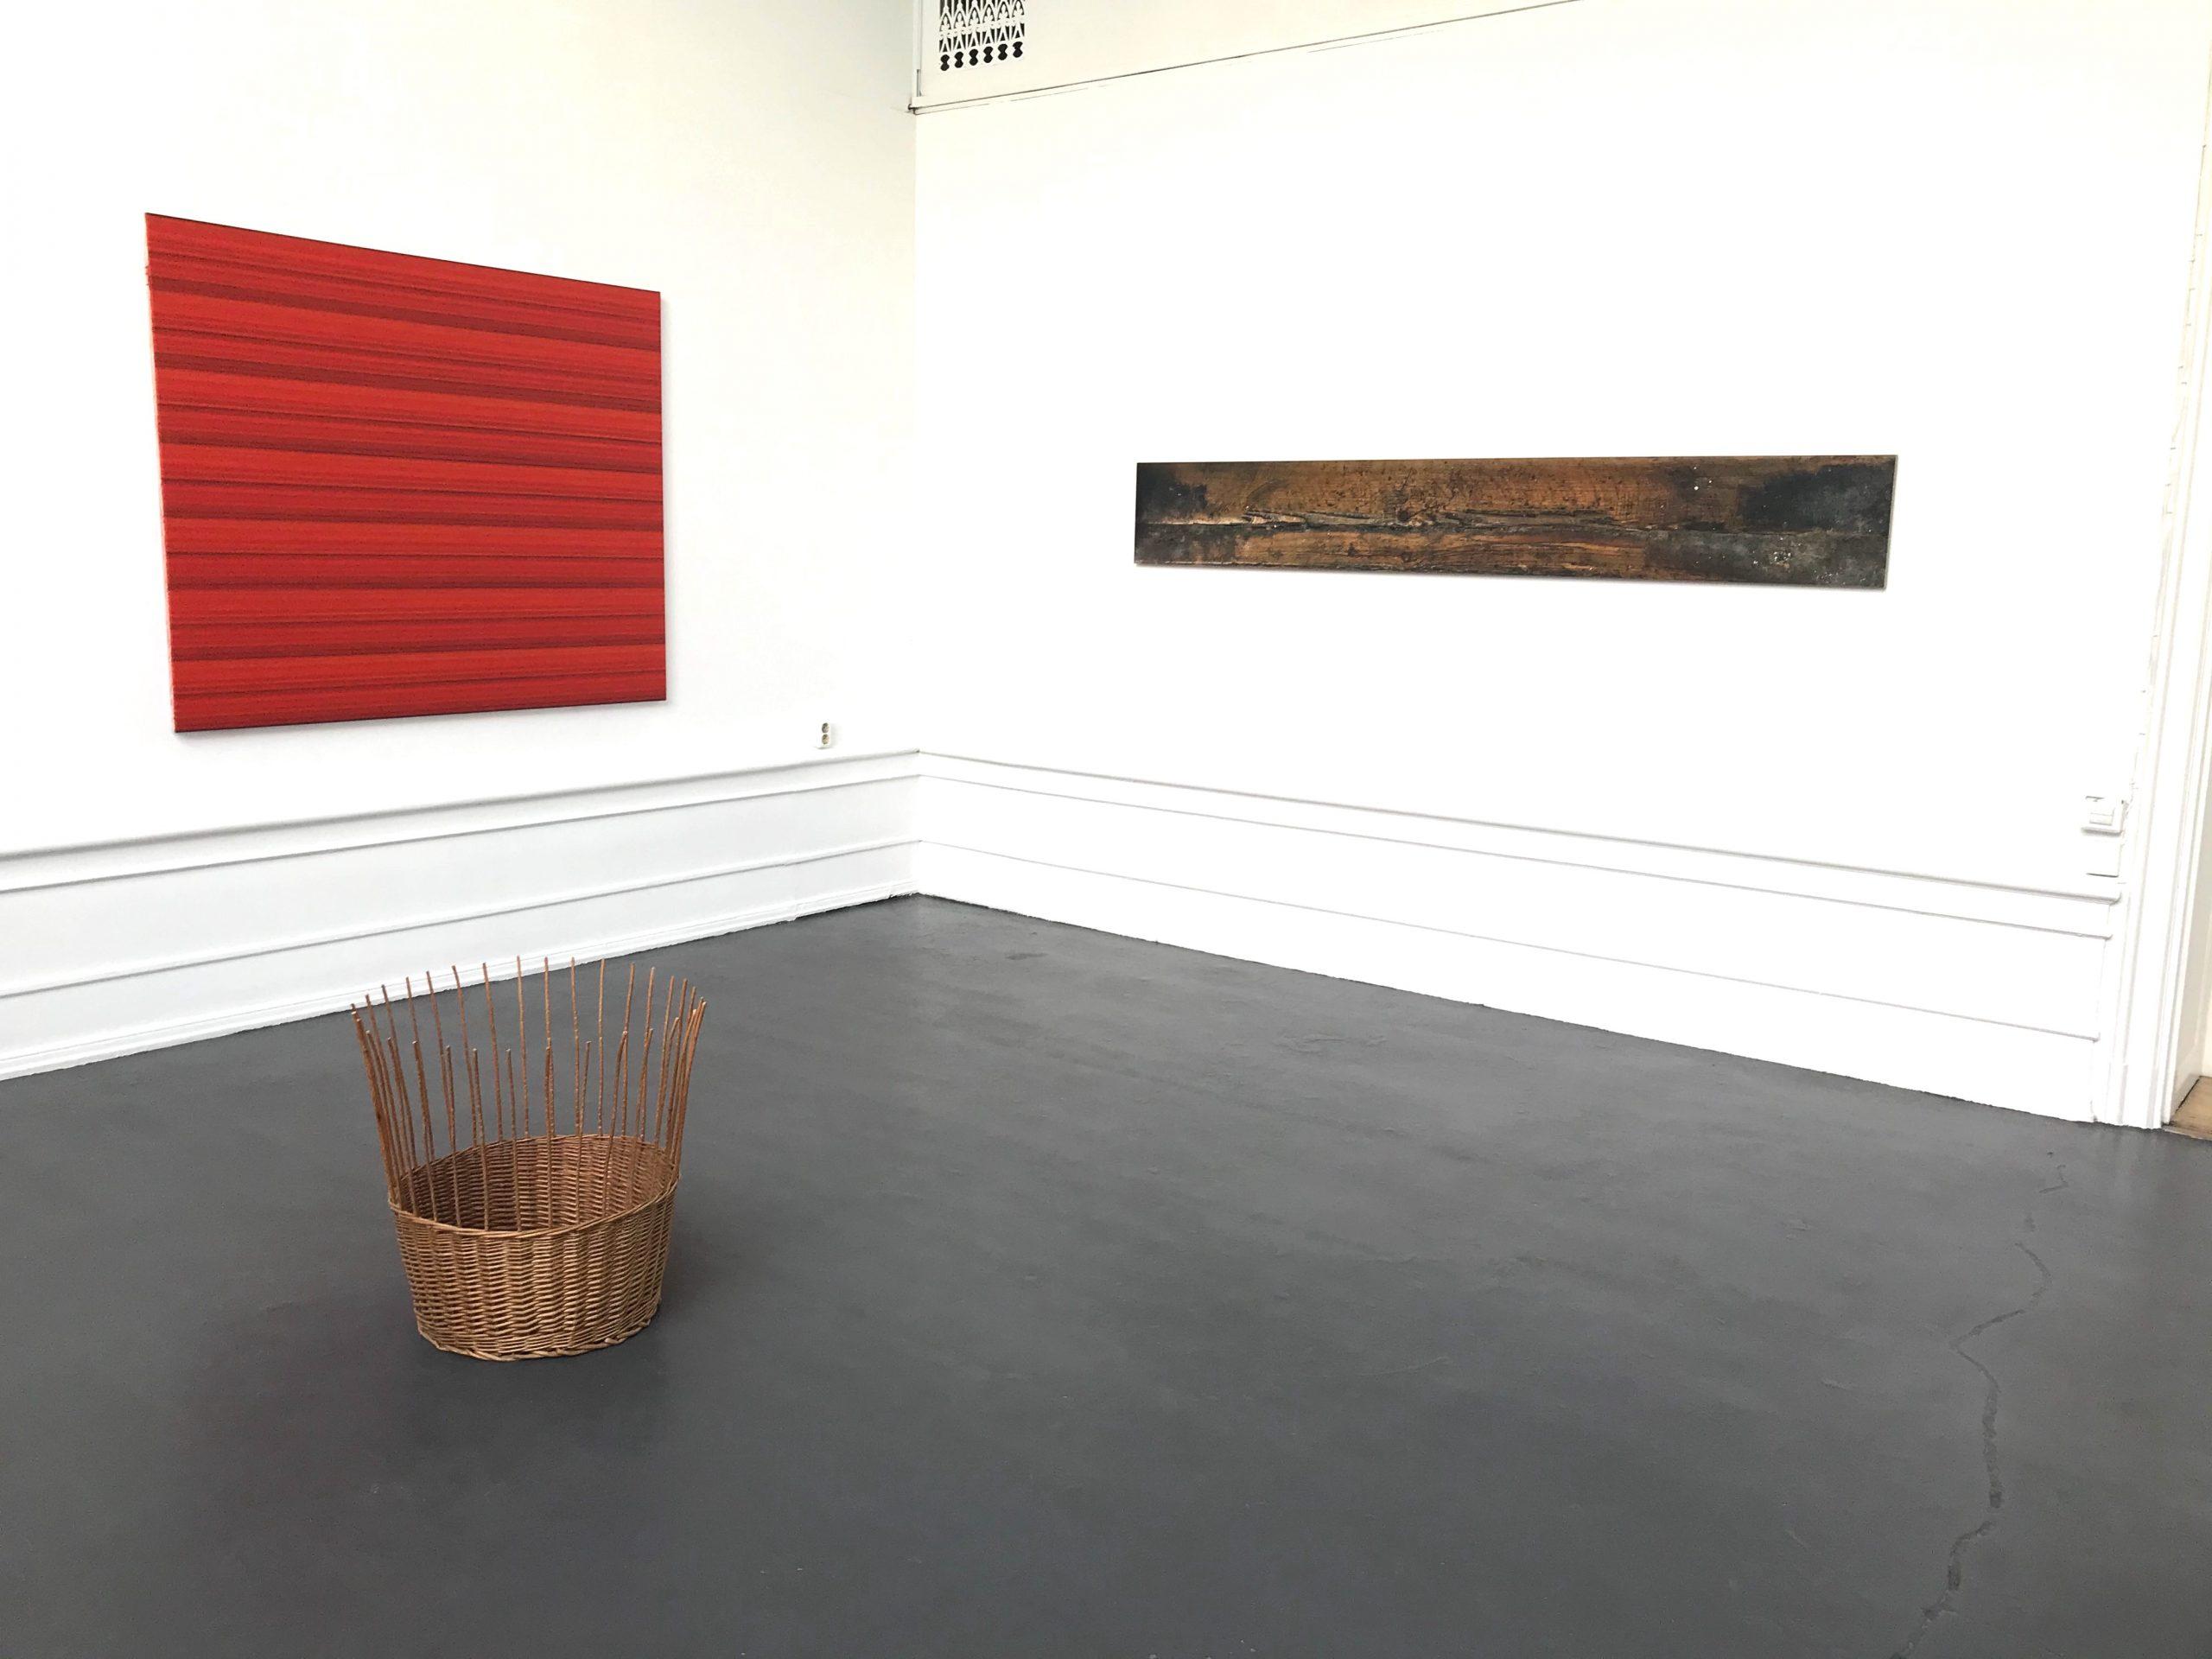 Ande och Materia / Mind and Matter, april 2020. Jakob Solgren (Sculpture), Rickard Sollman  (Painting), Kristoffer Nilsson (photography)